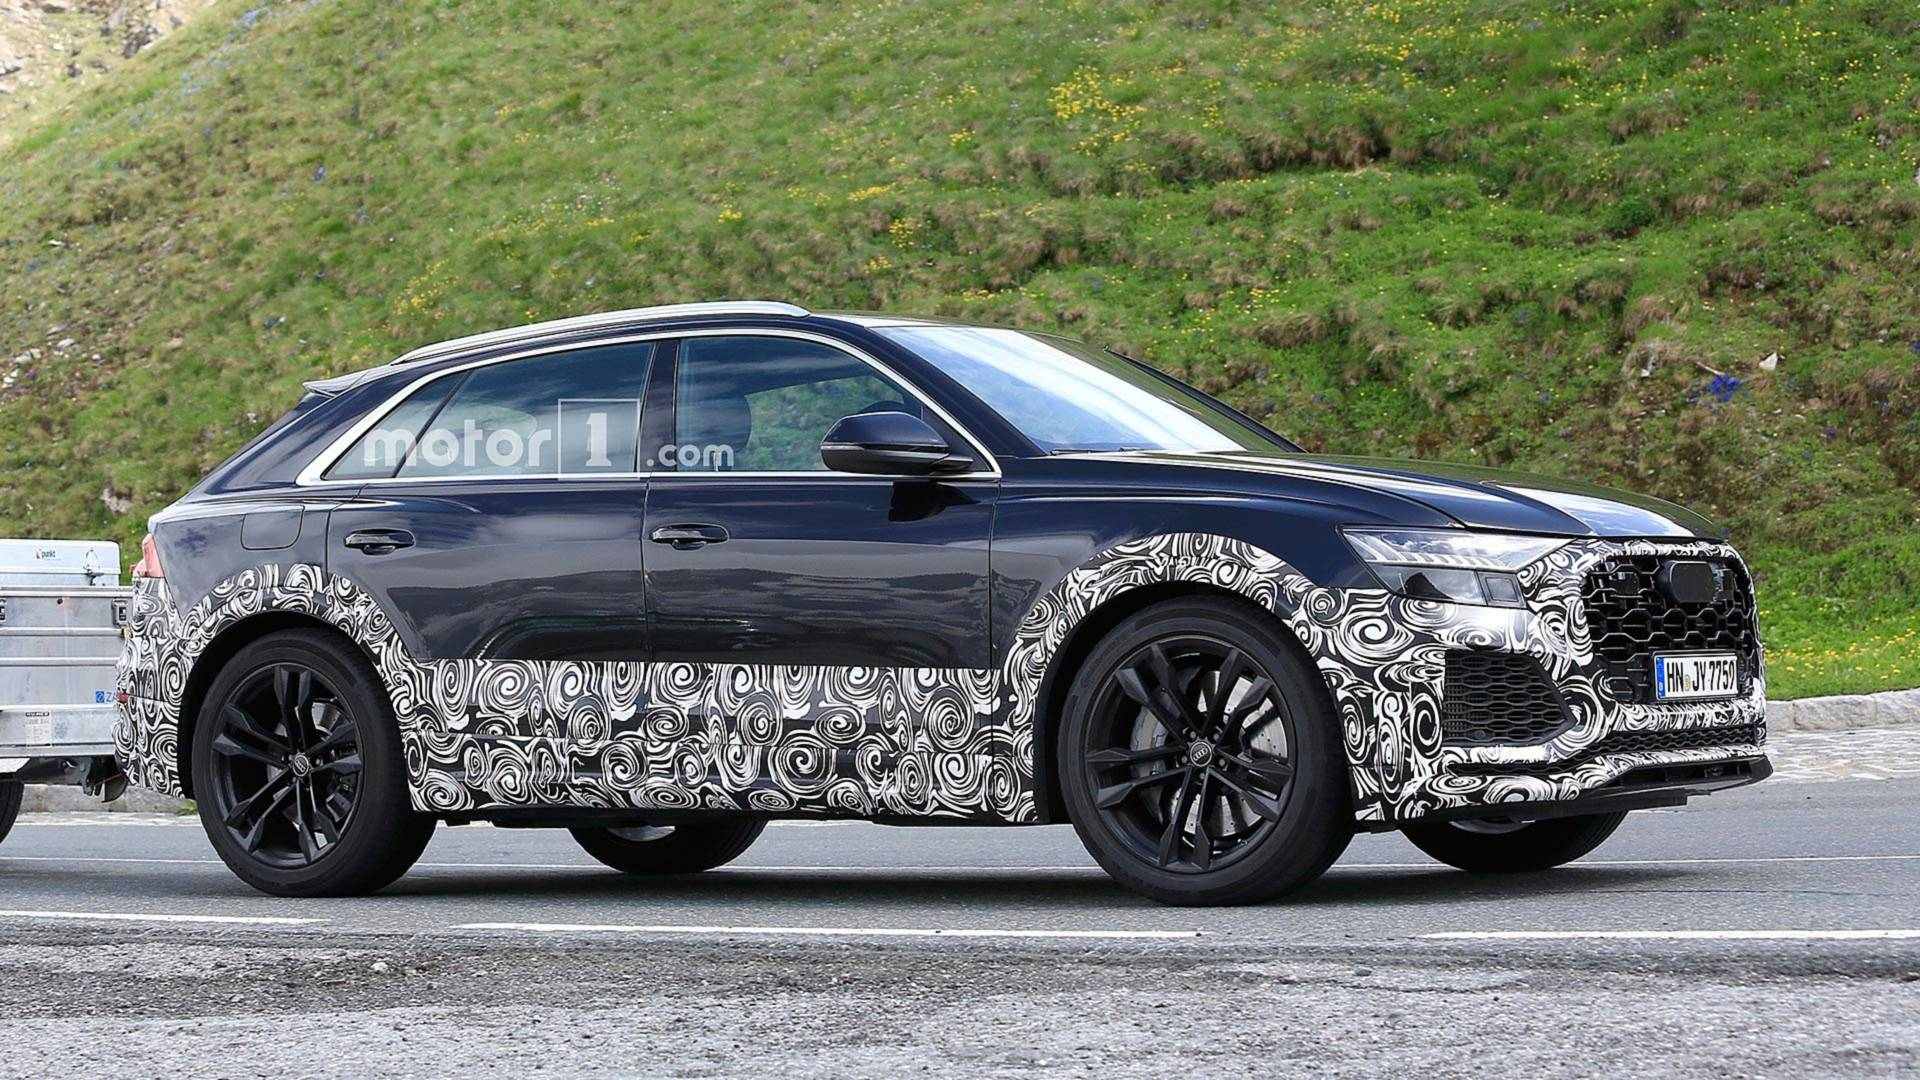 Audi Rs Q8 To Use Porsche Panamera Turbo S E Hybrid Powertrain